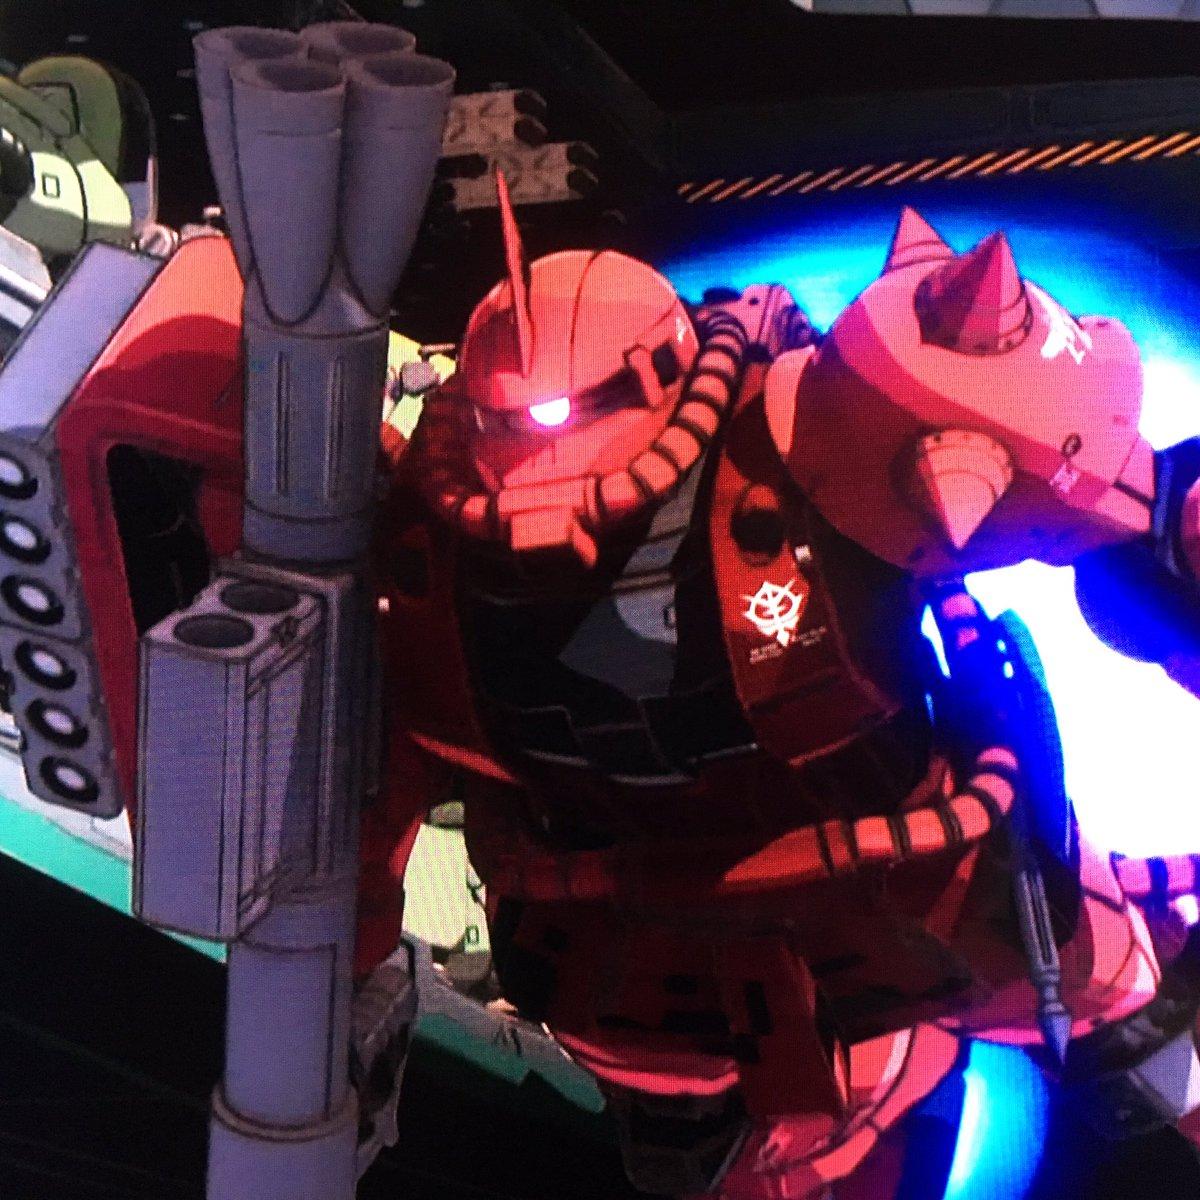 Rick Deckard The Origin版シャア専用ザクのカッコよさ 赤いモビルスーツ 機動戦士ガンダムtheorigin シャア専用ザク 機動戦士ガンダム シャア ザク 赤い彗星 前夜赤い彗星 機動戦士ガンダムtheorigin前夜赤い彗星 T Co Anpamon0ed